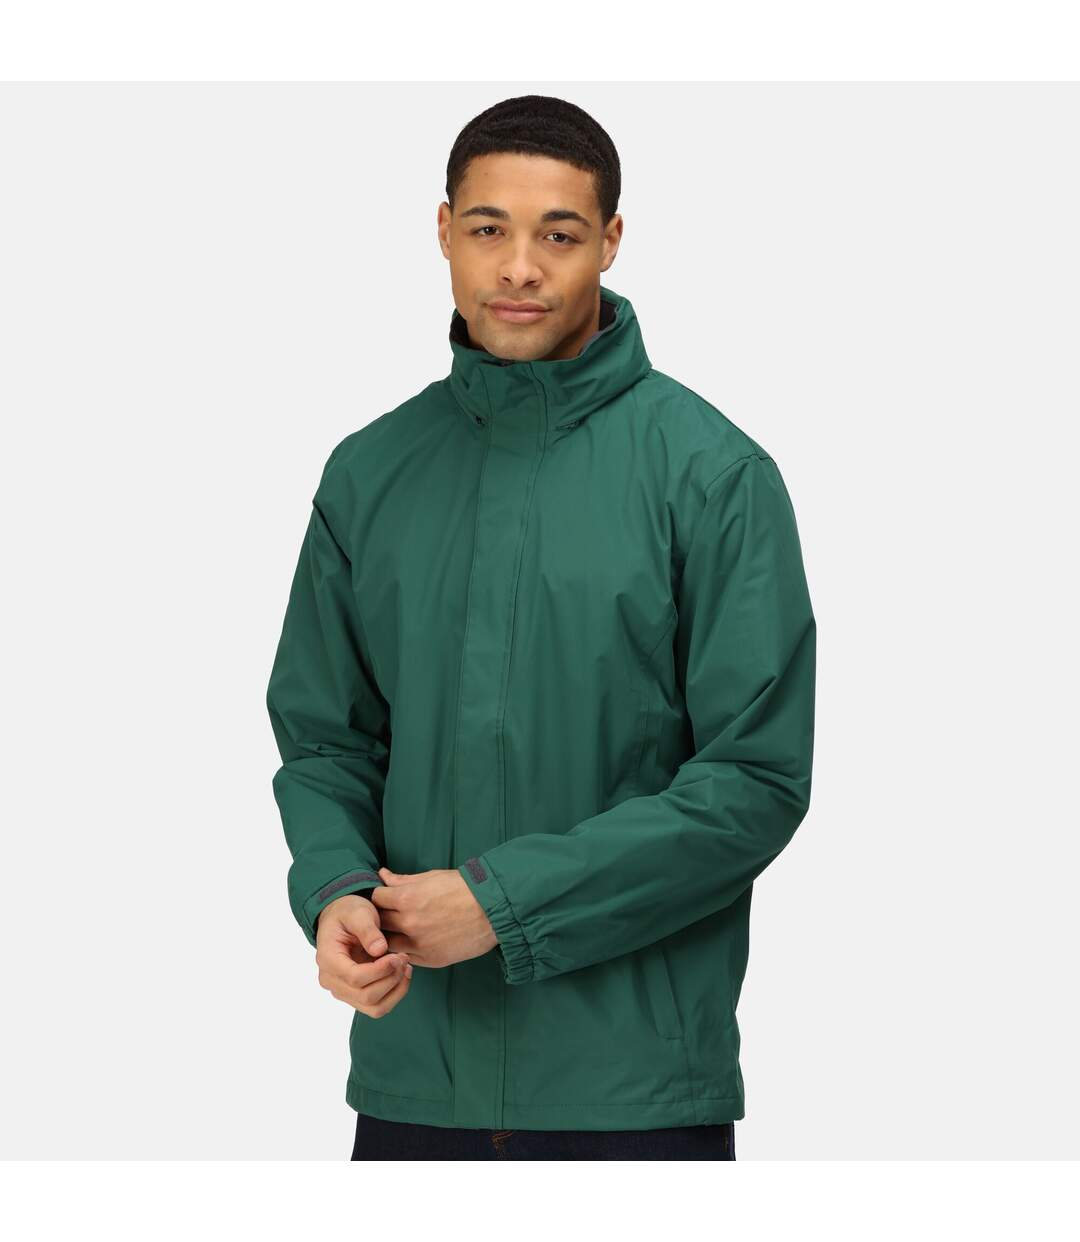 Regatta Mens Standout Ardmore Jacket (Waterproof & Windproof) (Bottle Green/Seal Grey) - UTBC3041